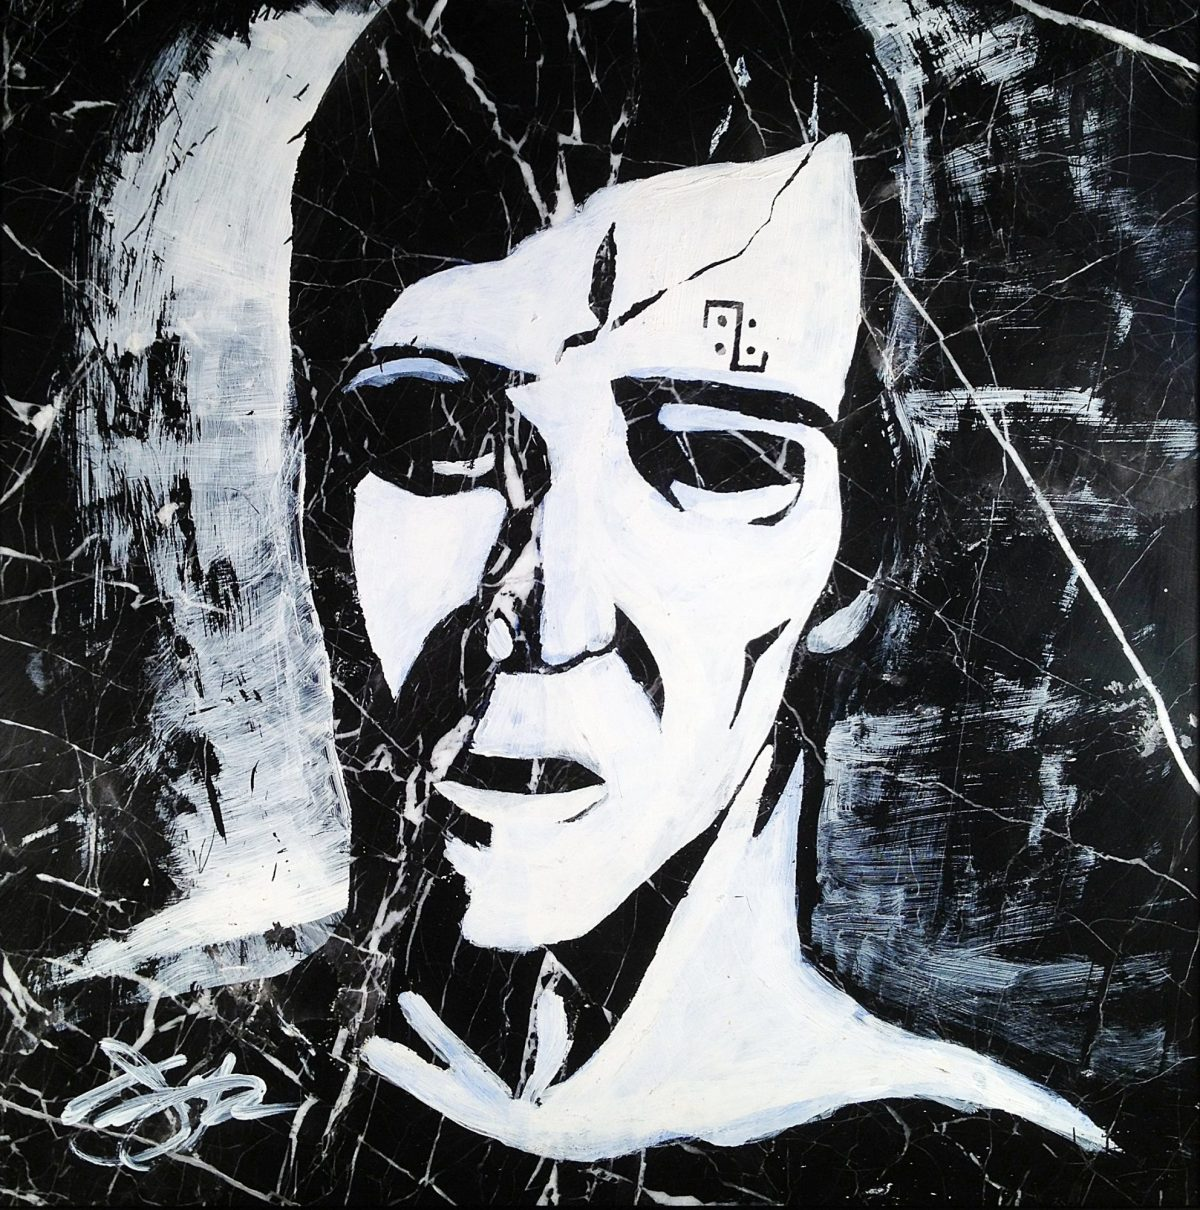 Owen York Art - Young Portal